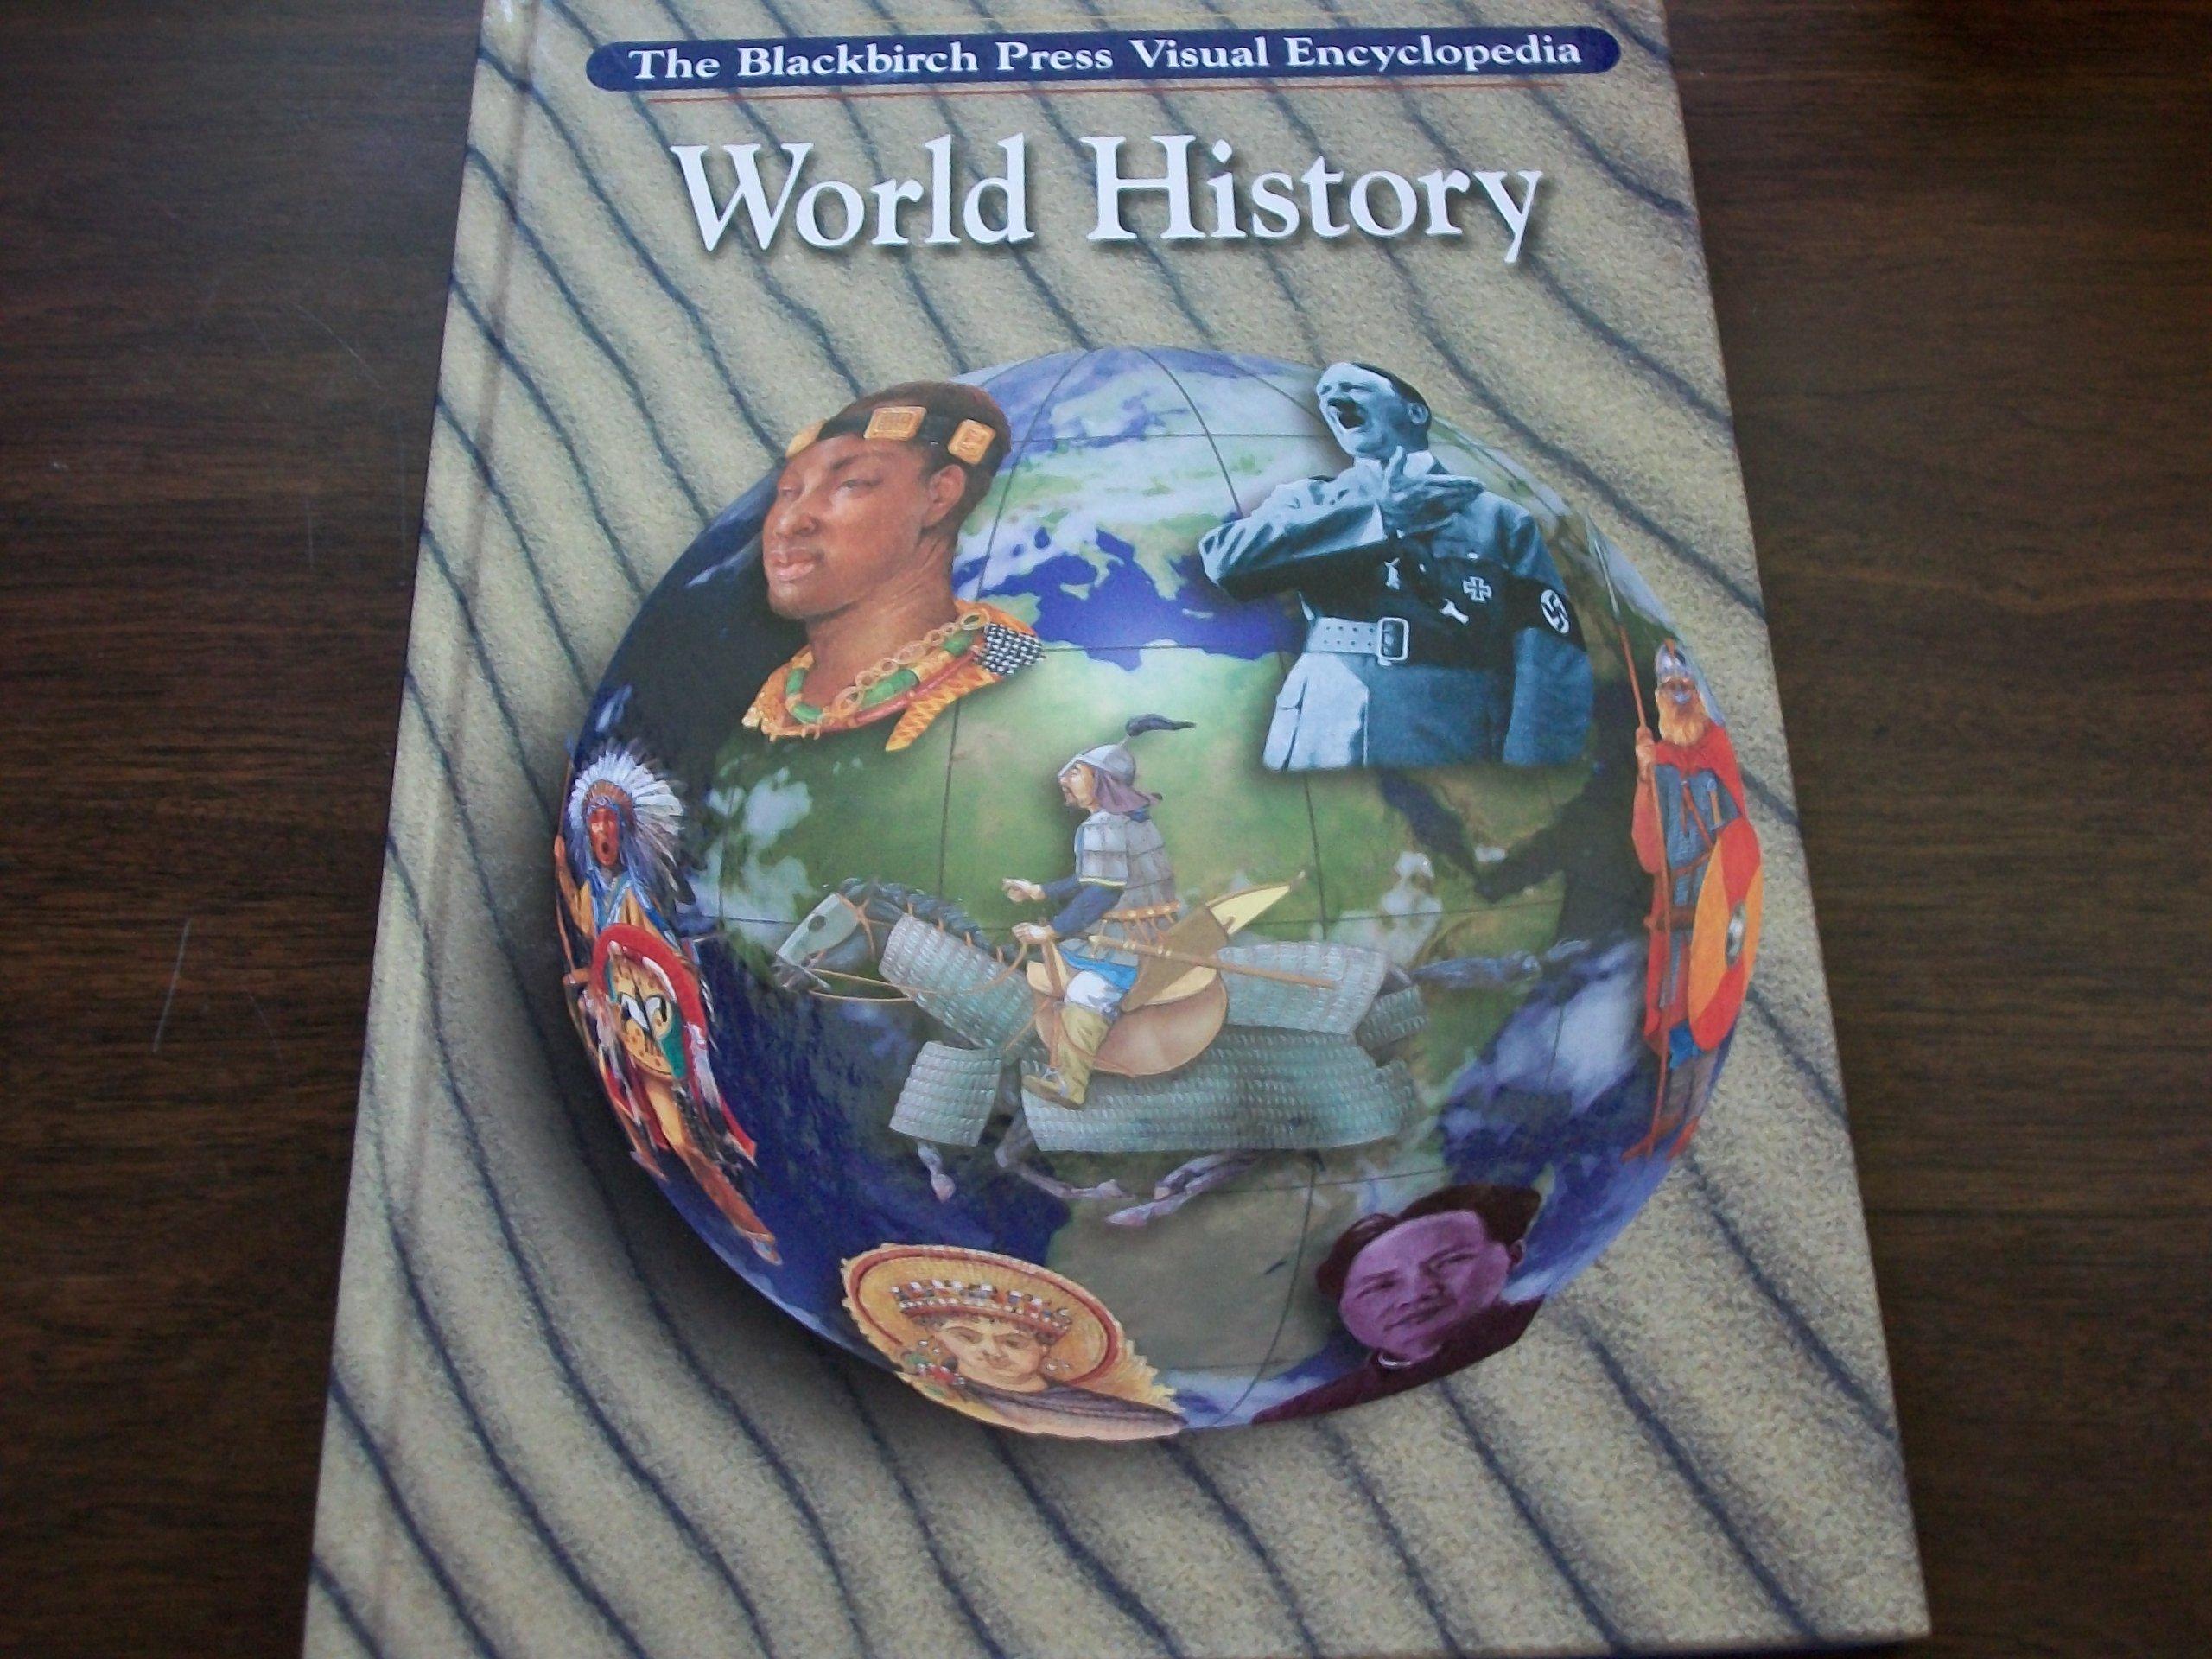 Download Blackbirch Visual Encyclopedias - World History PDF